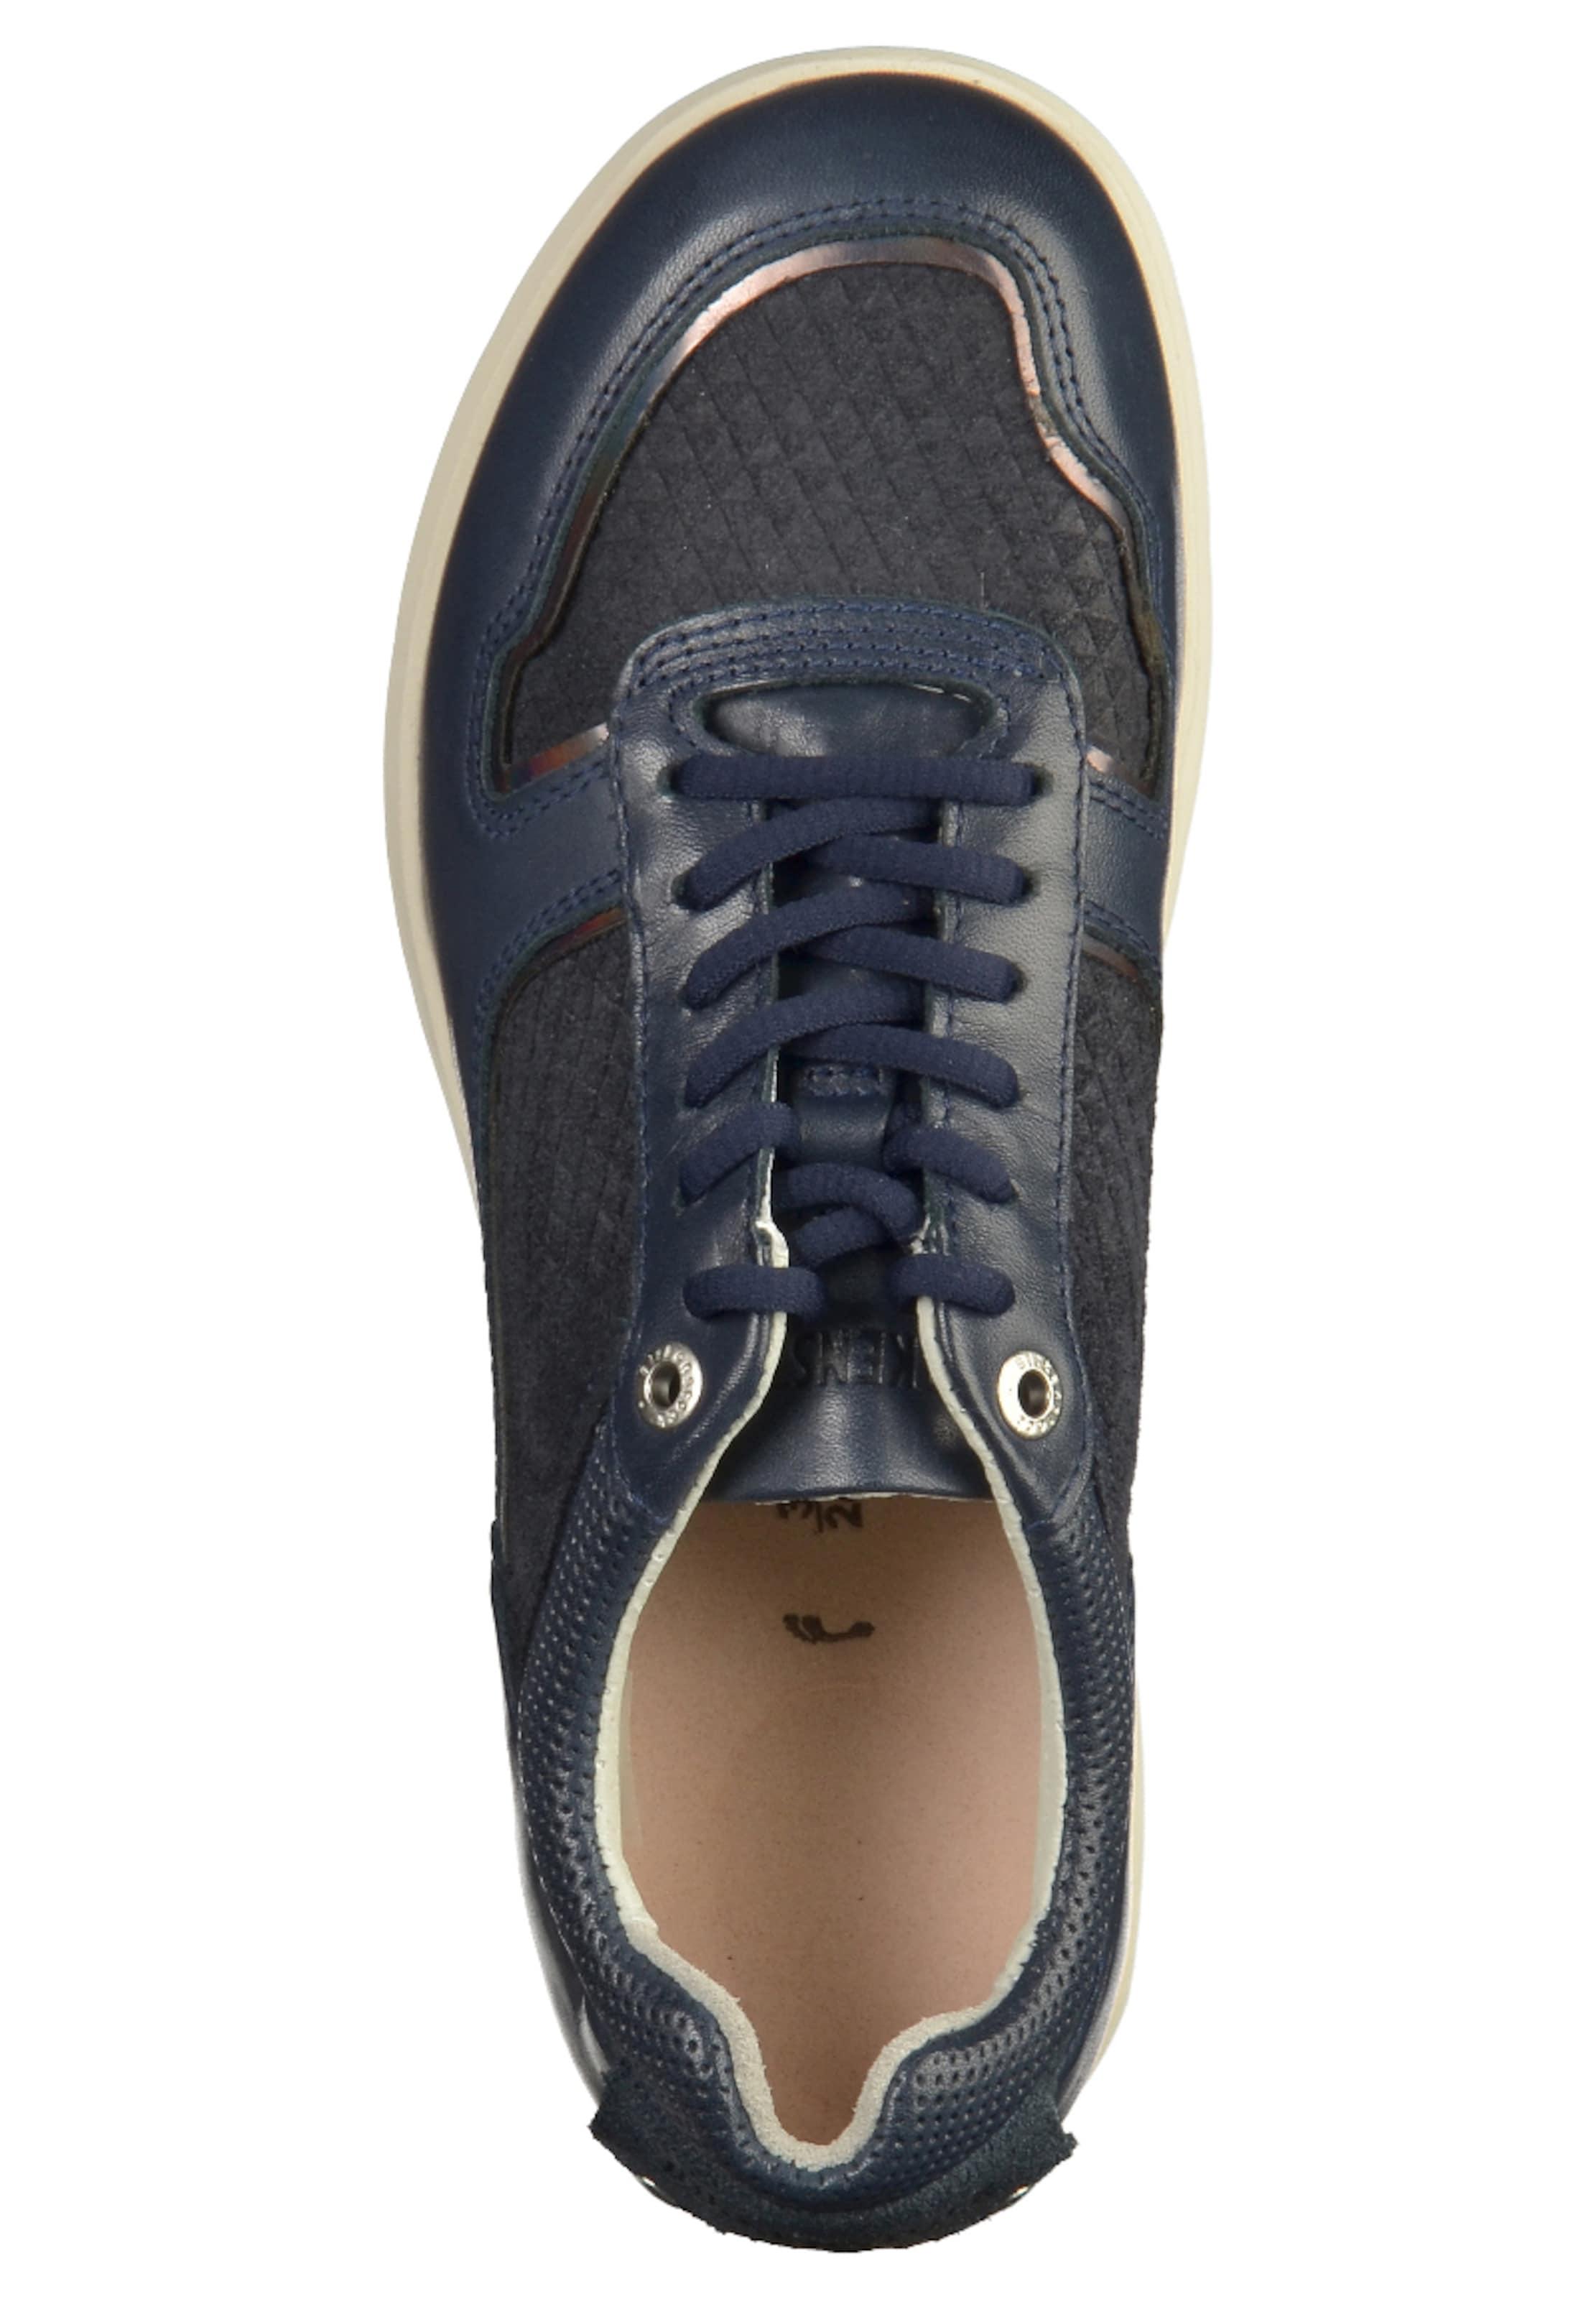 'cincinnati' Sneaker 'cincinnati' Sneaker Blau Birkenstock Birkenstock In Blau In E29IDH